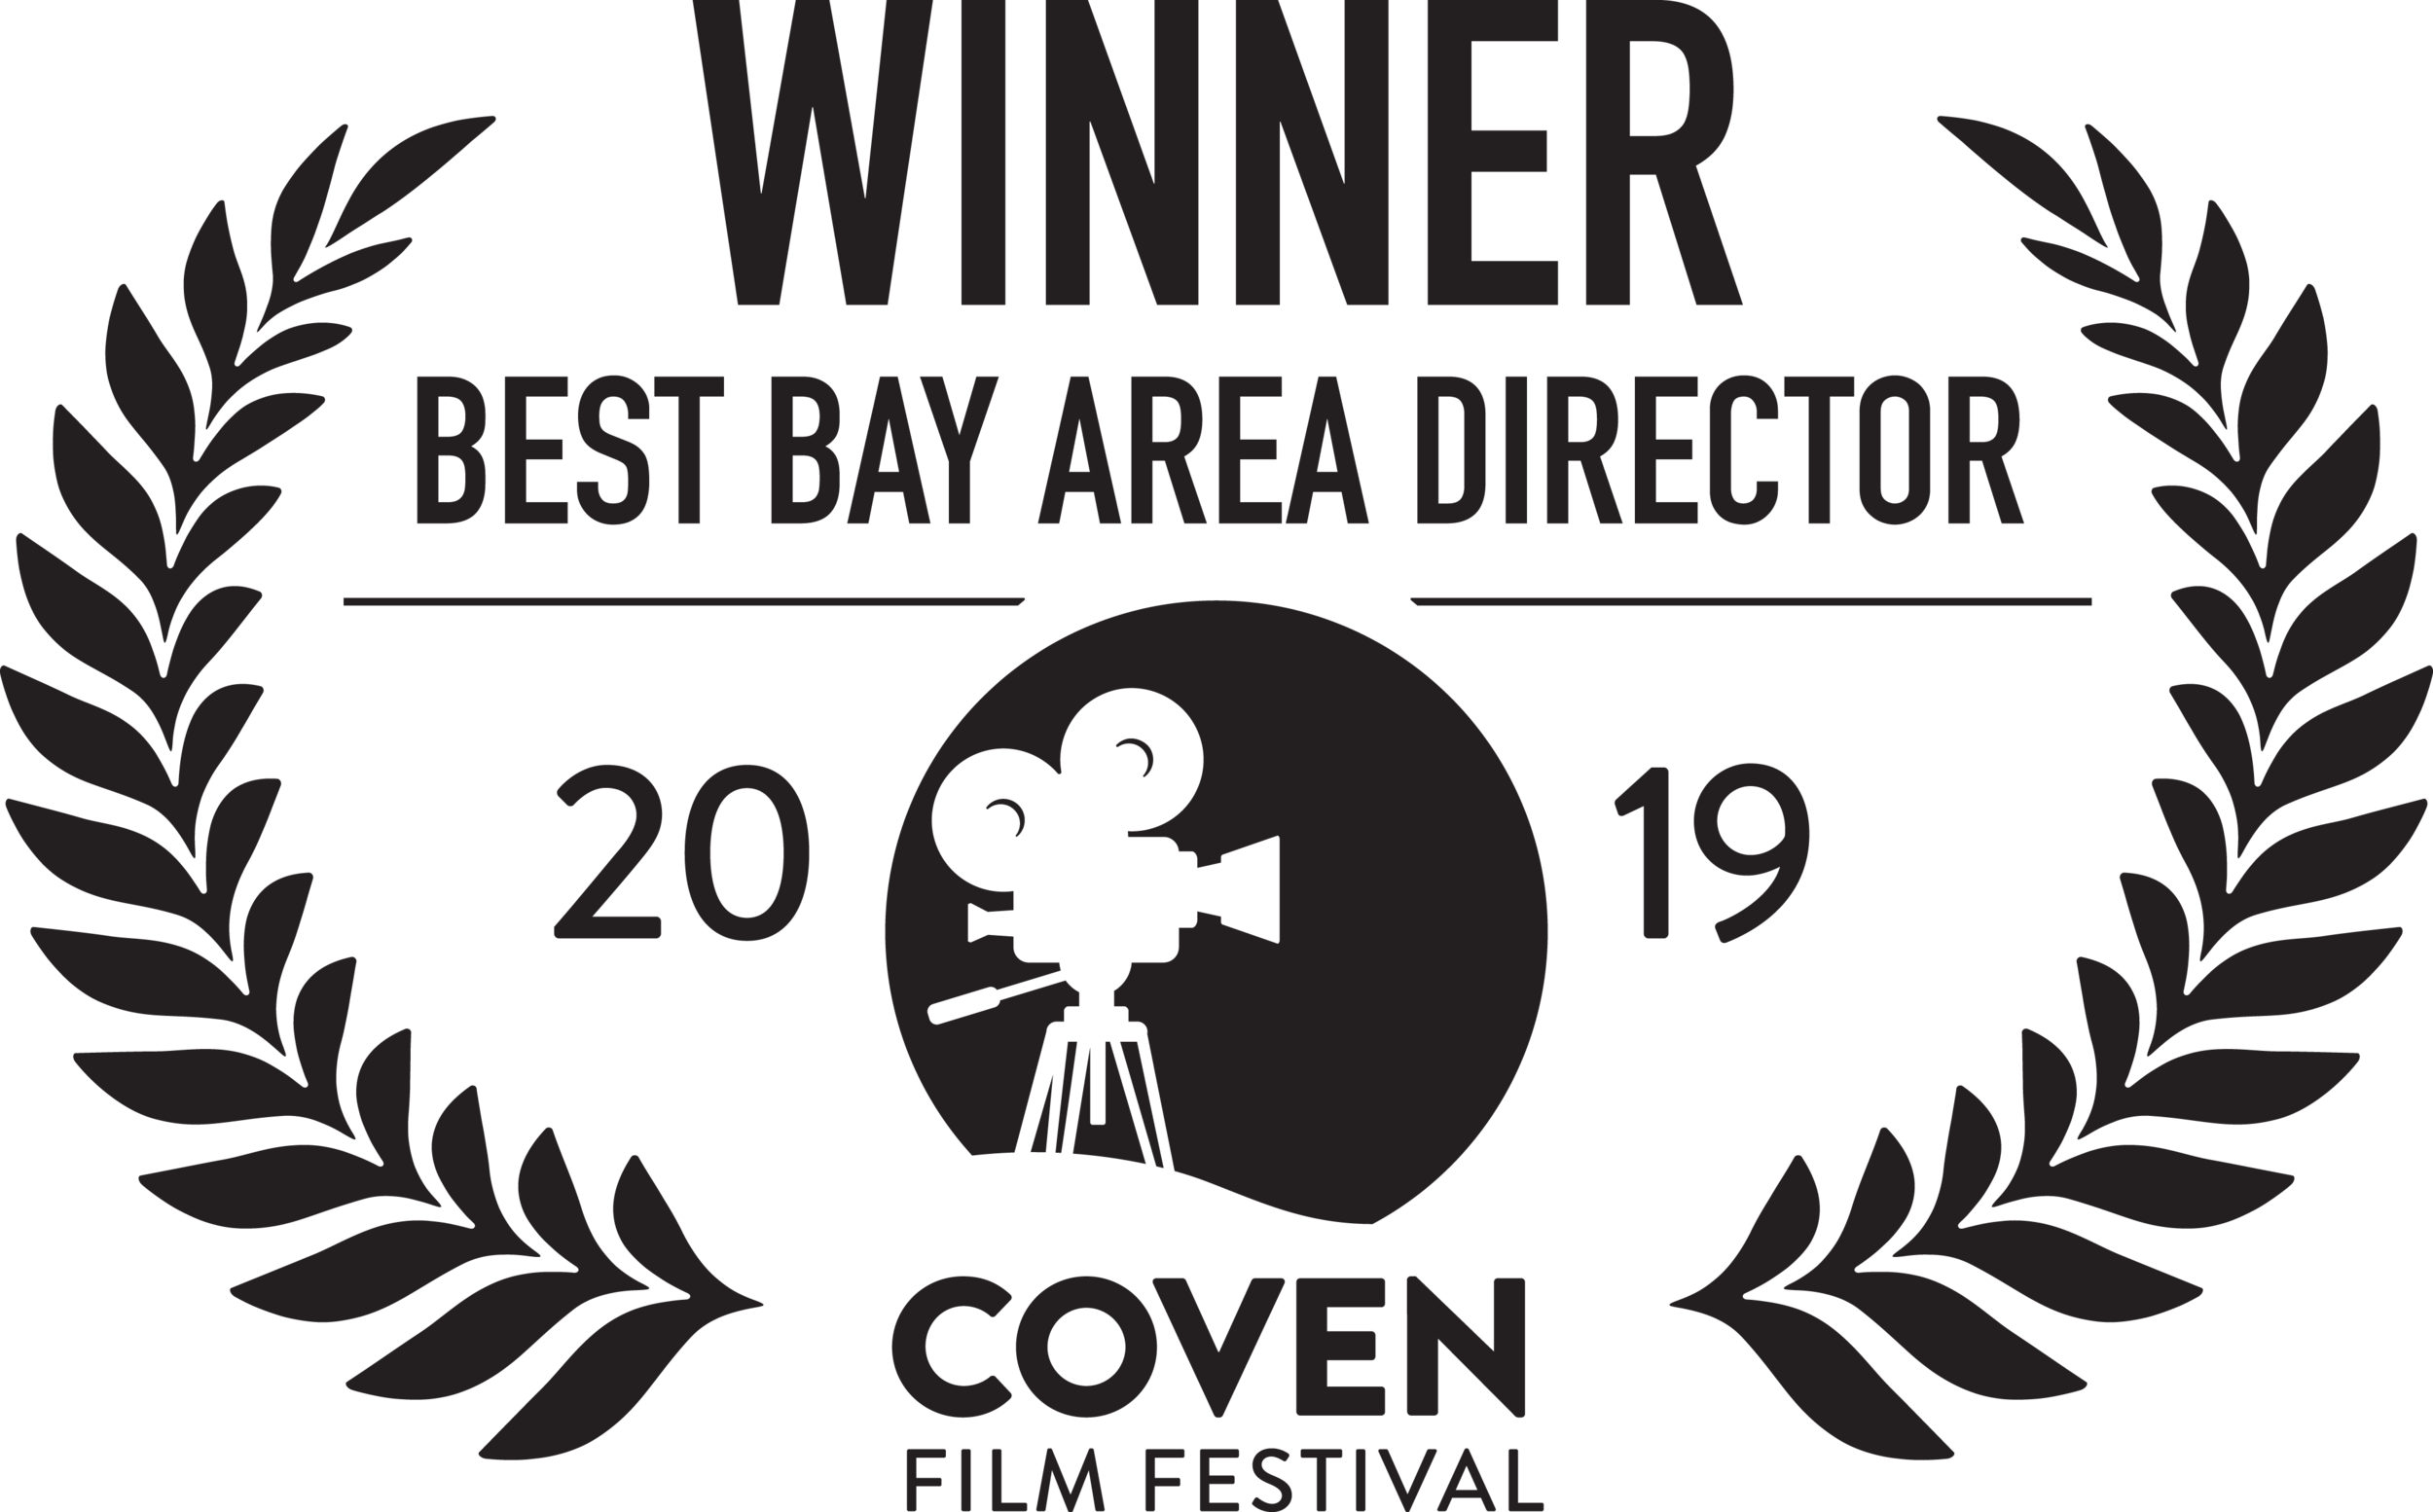 Laurels-Black-Best Bay Area Director.png